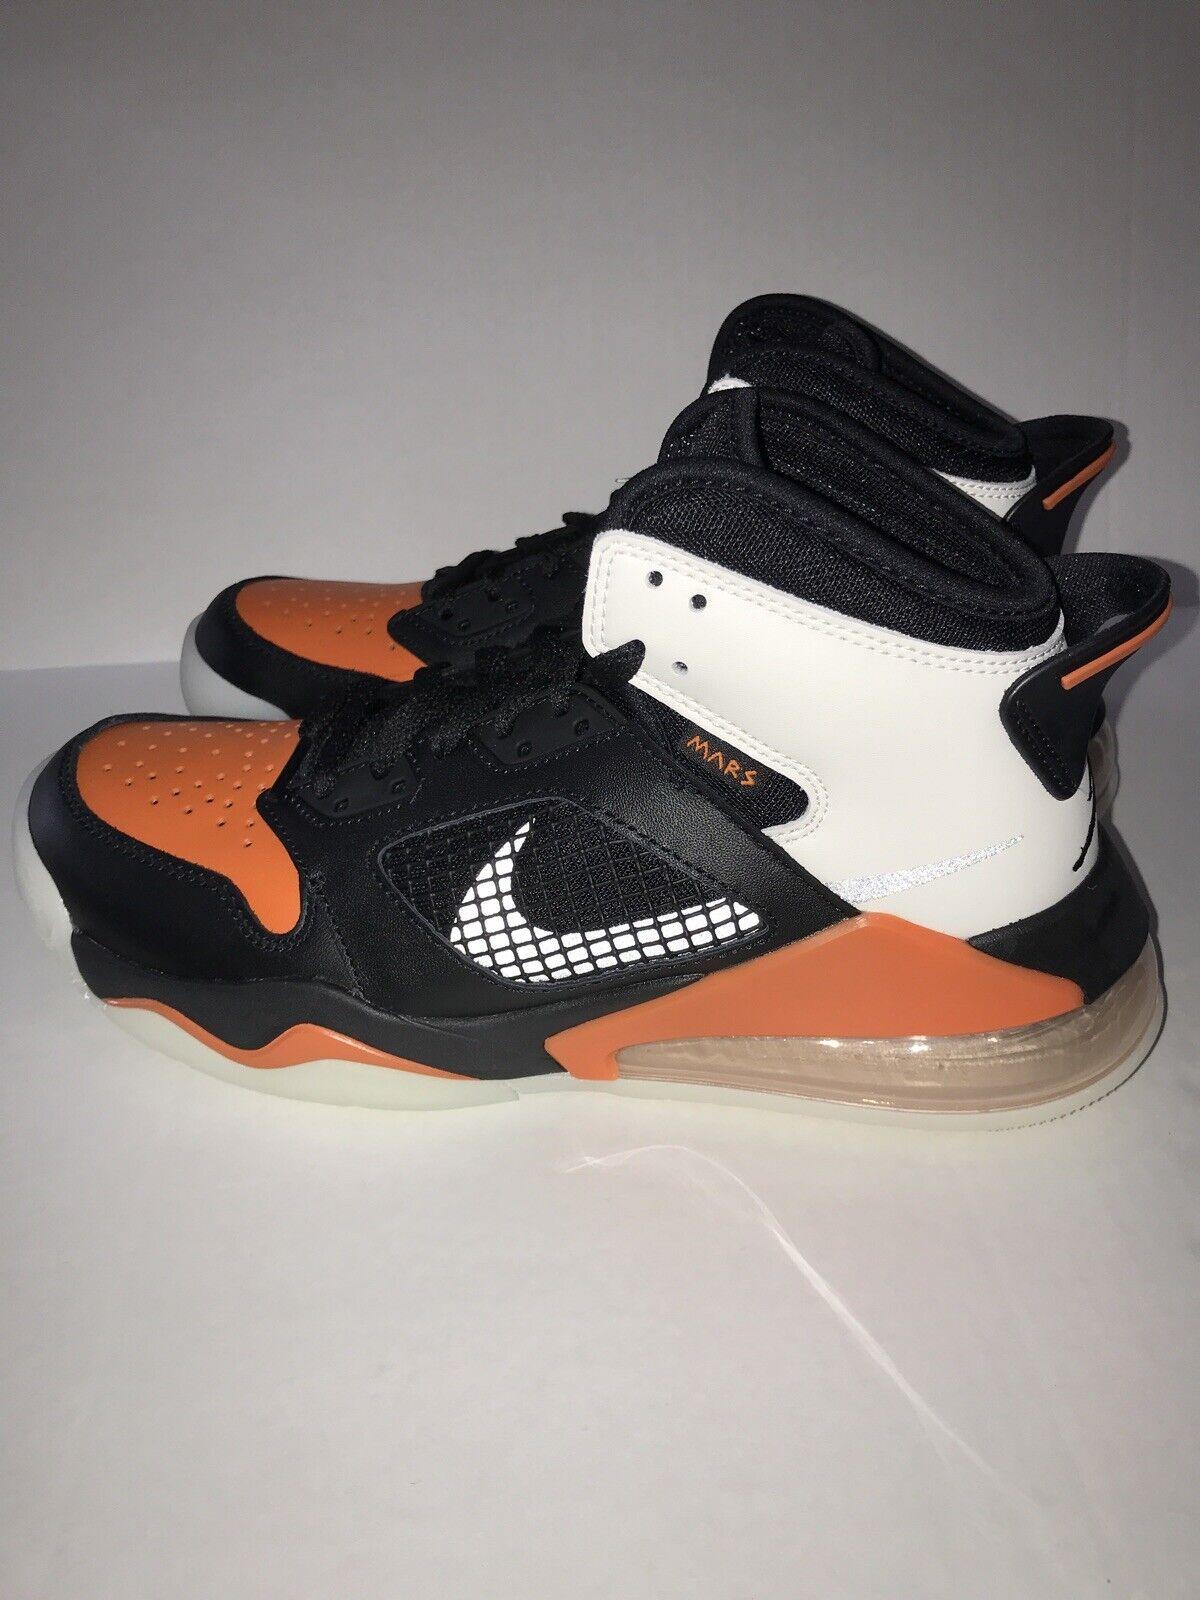 Nike Air Jordan Mars 270 Basketball Shoes Black Starfish CD7070-008 Men's 8 New